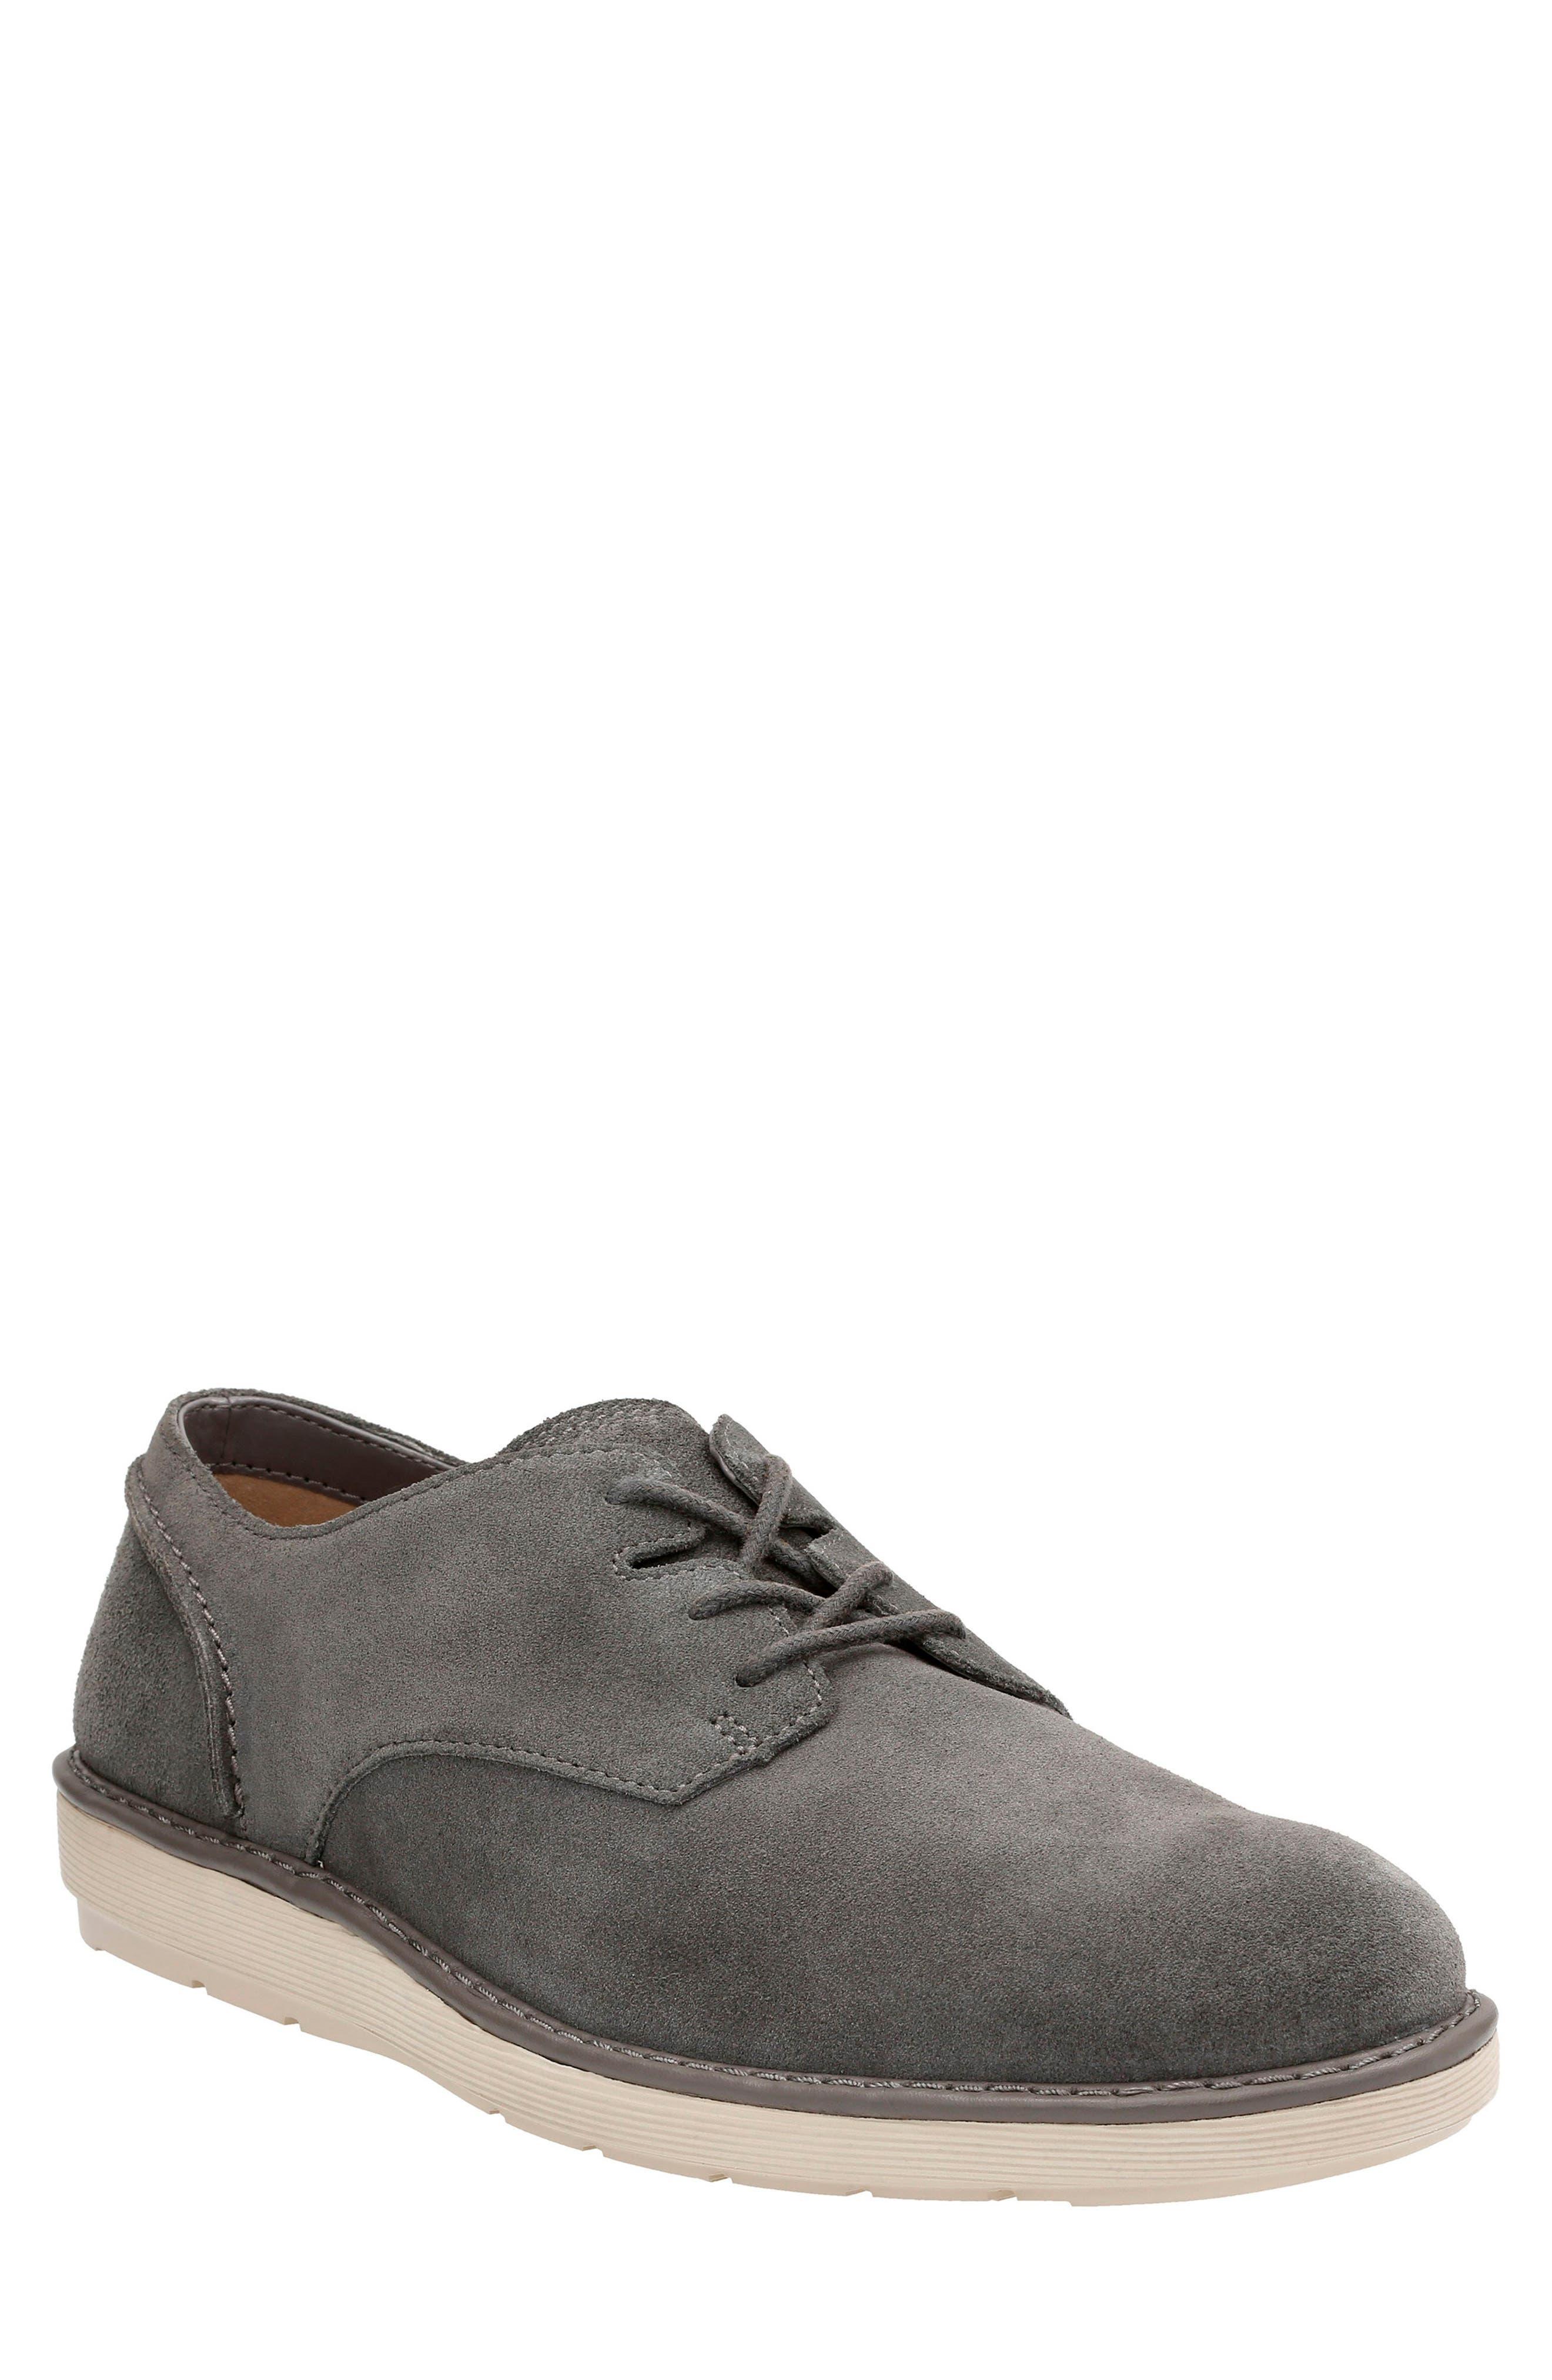 Fayeman Plain Toe Derby,                             Main thumbnail 1, color,                             Dark Grey Suede